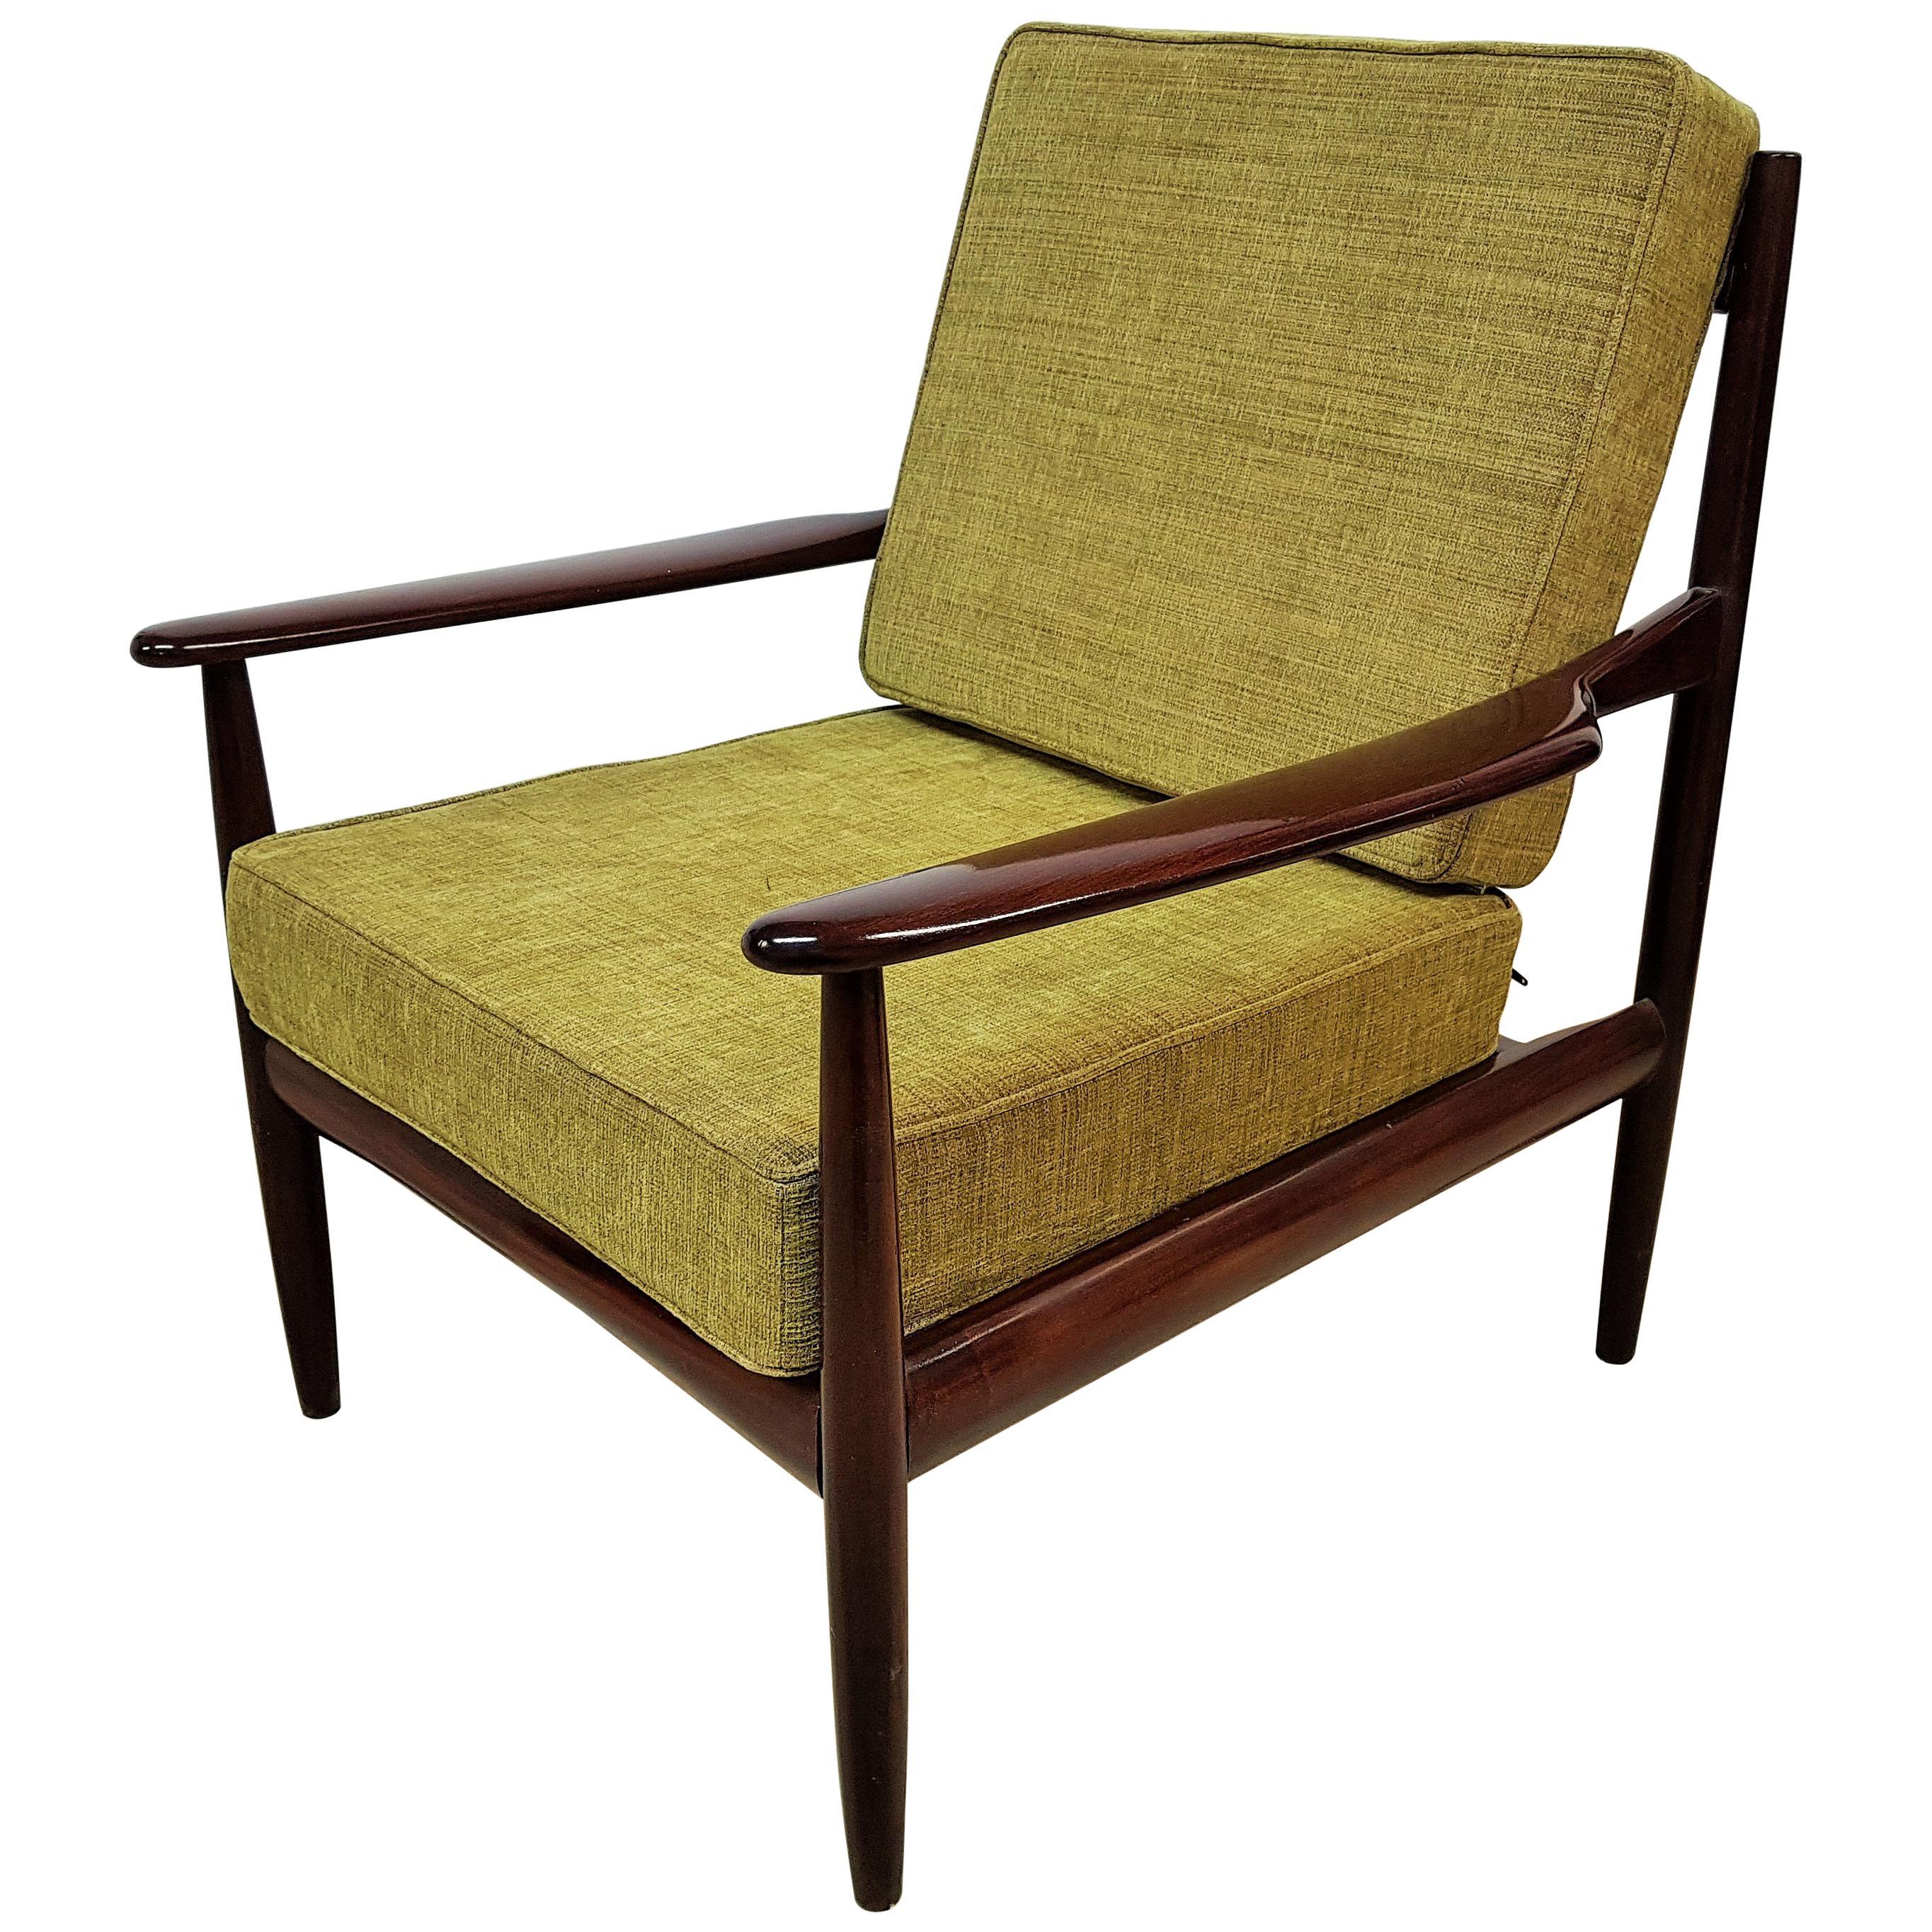 Midcentury Danish Teak Lounge Chair by Grete Jalk